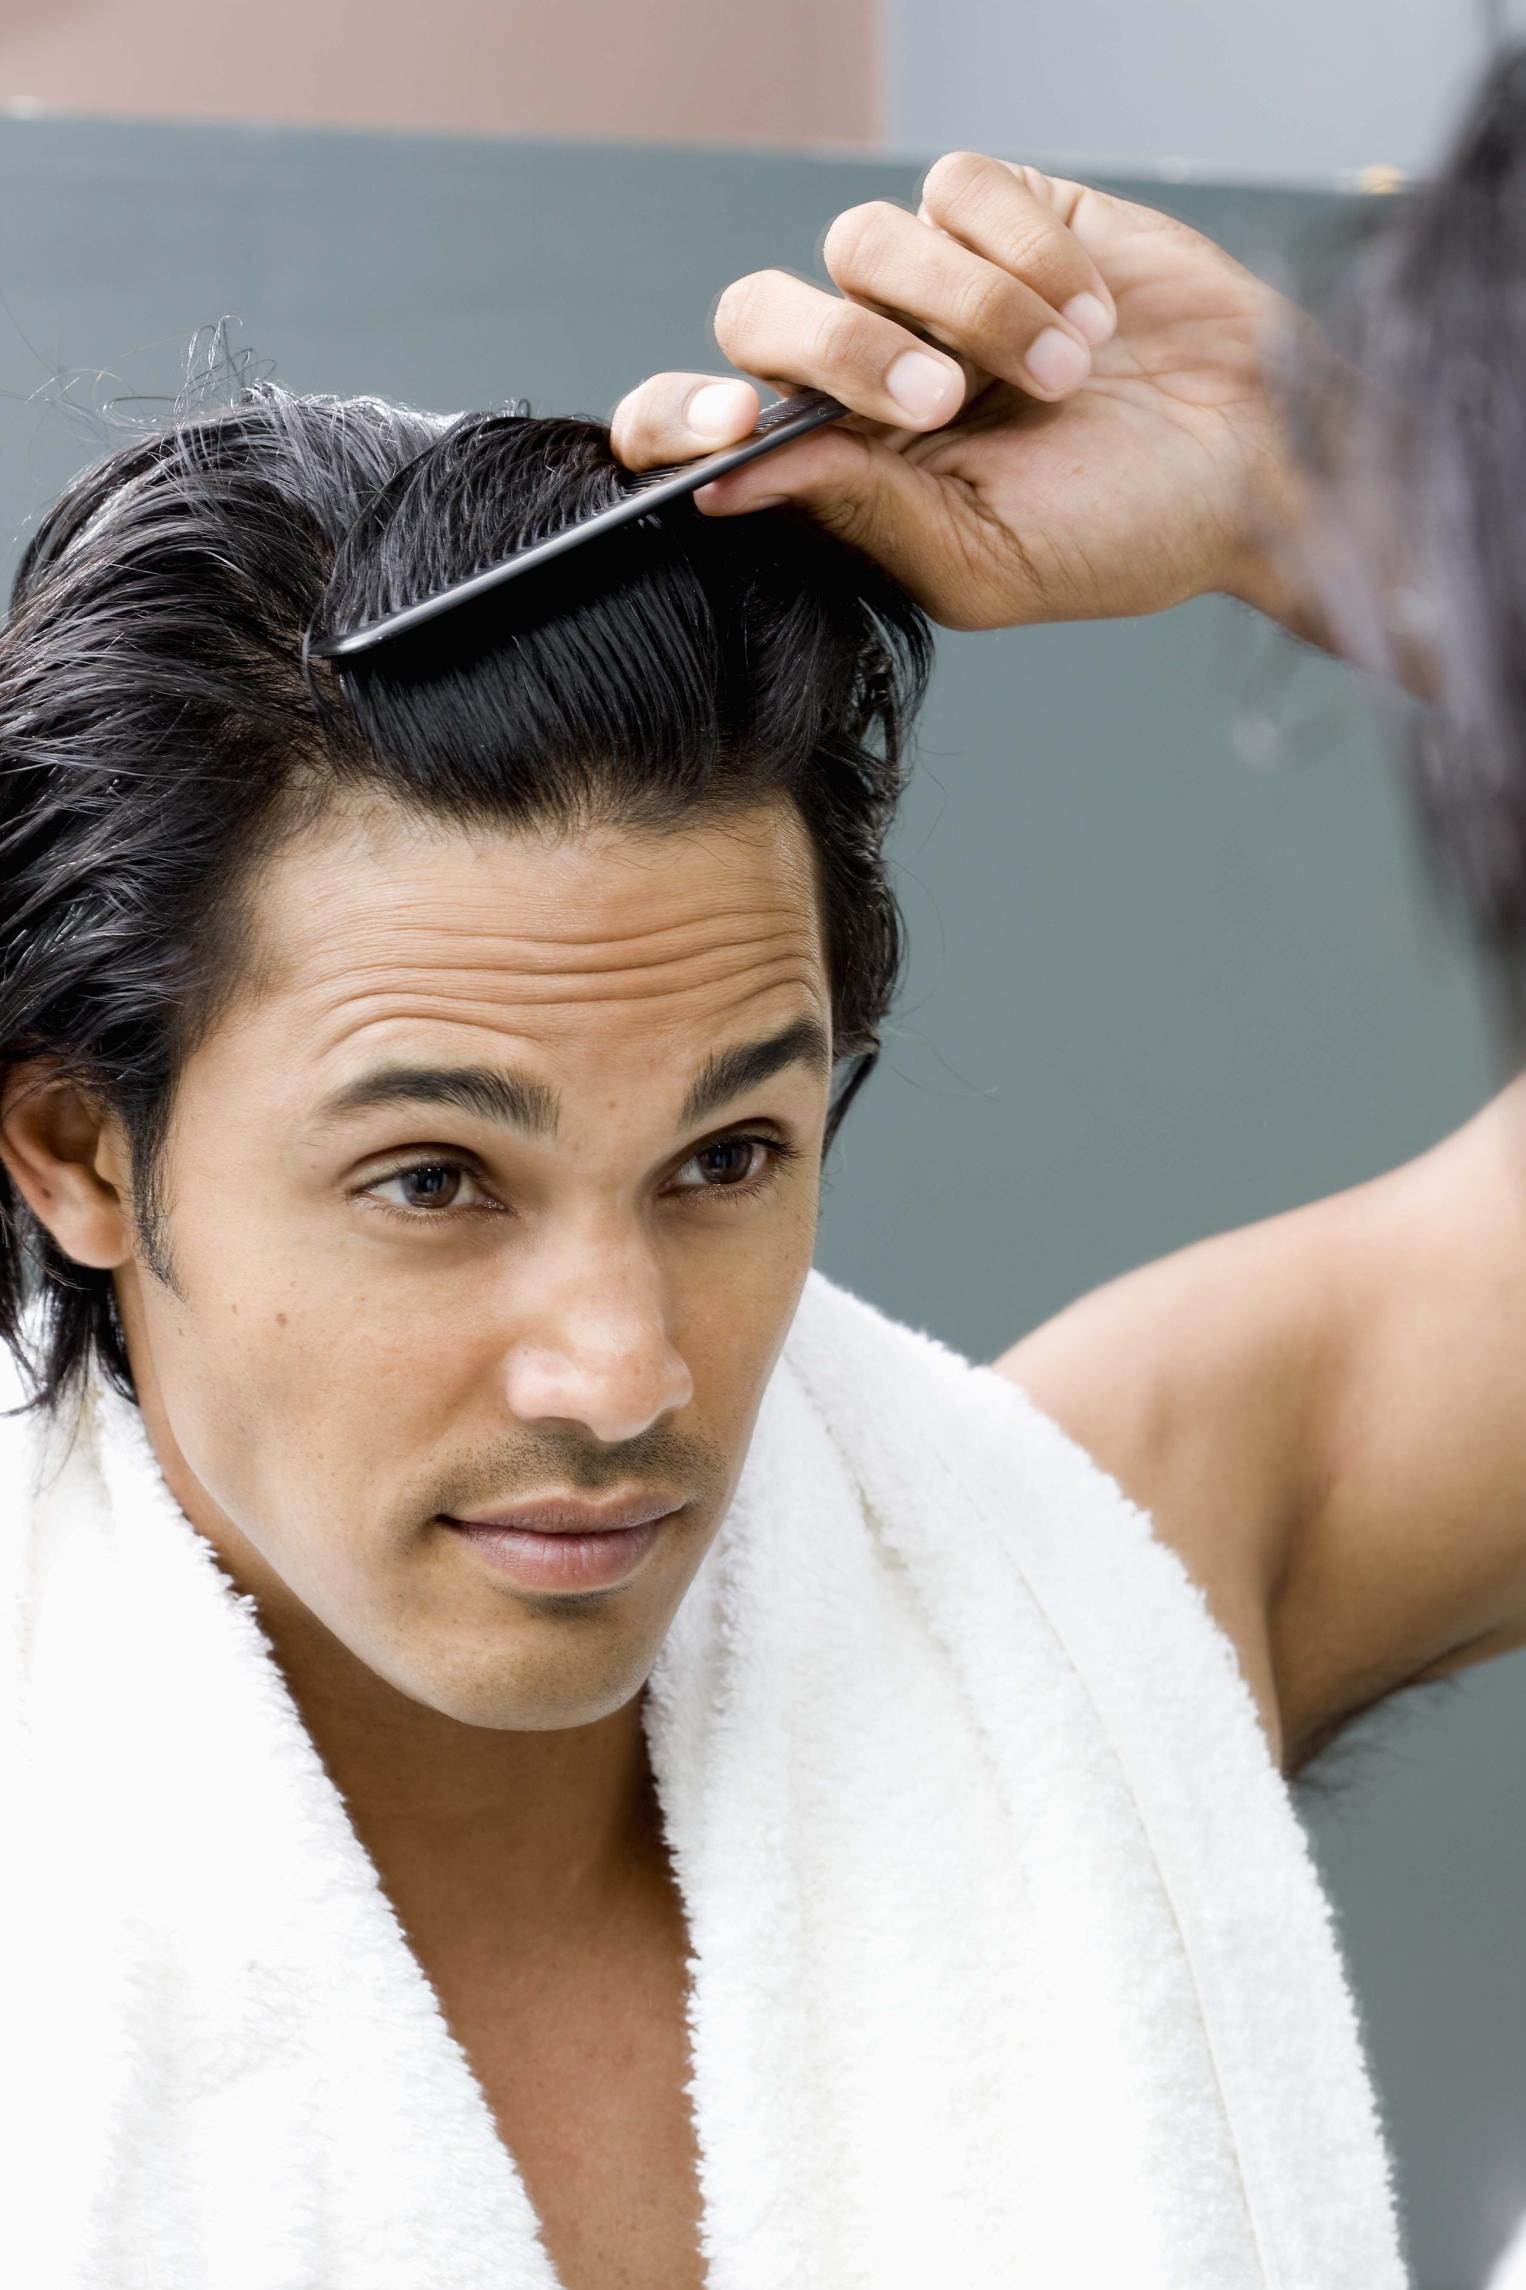 Cortar pelo hombre cortes de pelo hombre spiky zayn malik - Cortar el pelo en casa hombre ...